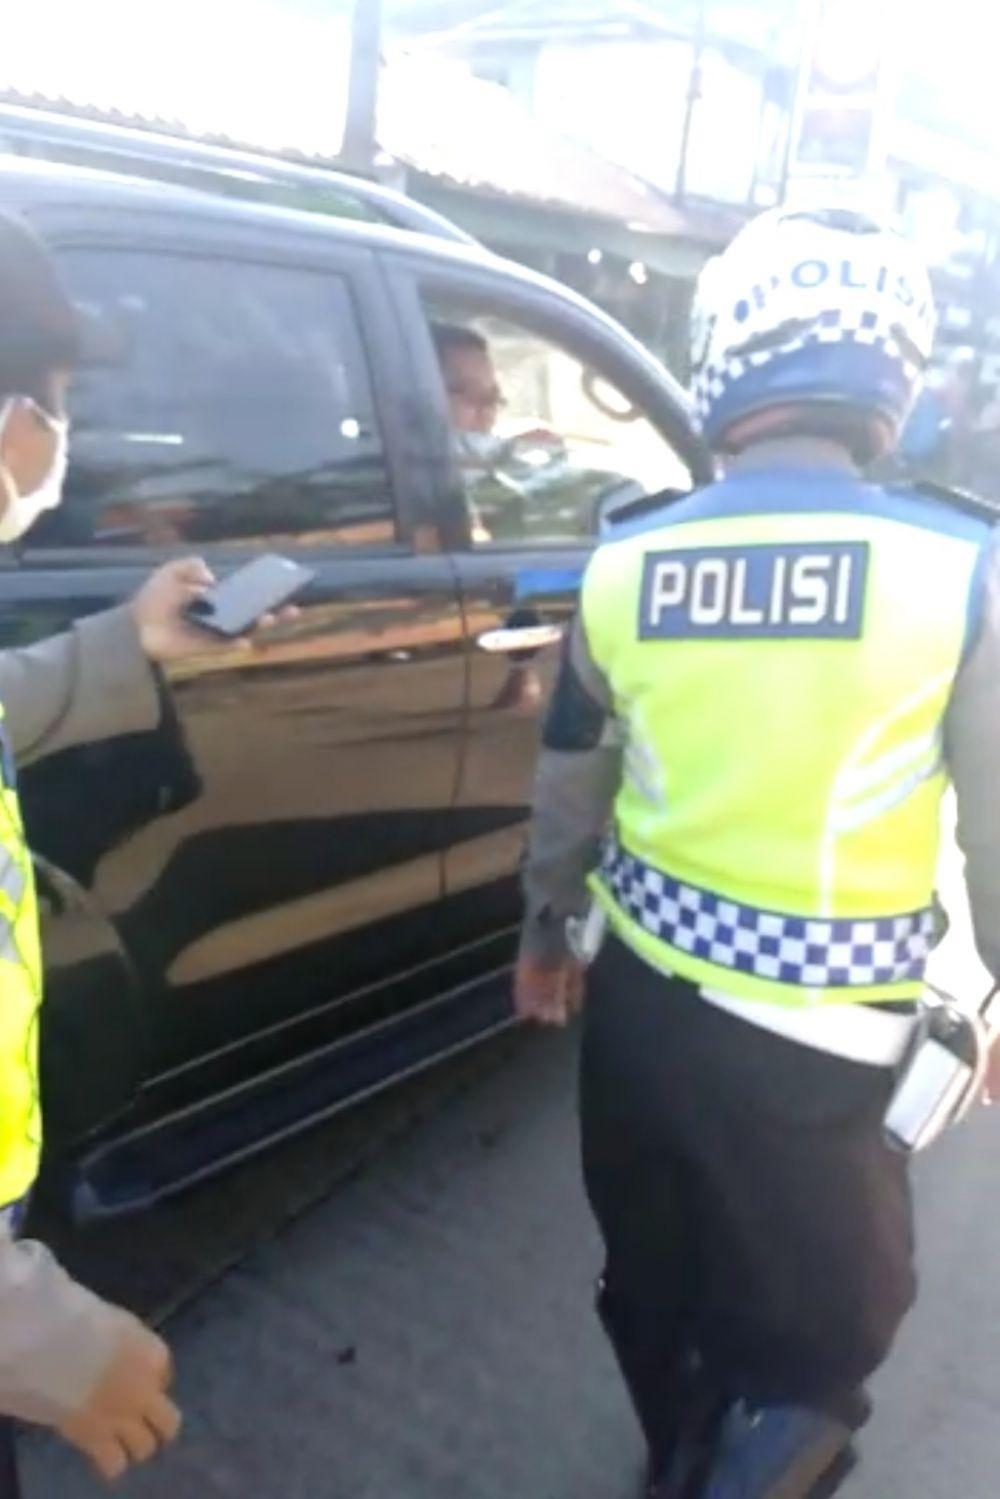 Langgar PSBB, Polda Jabar akan Mutasi Anggota Polrestabes Bandung